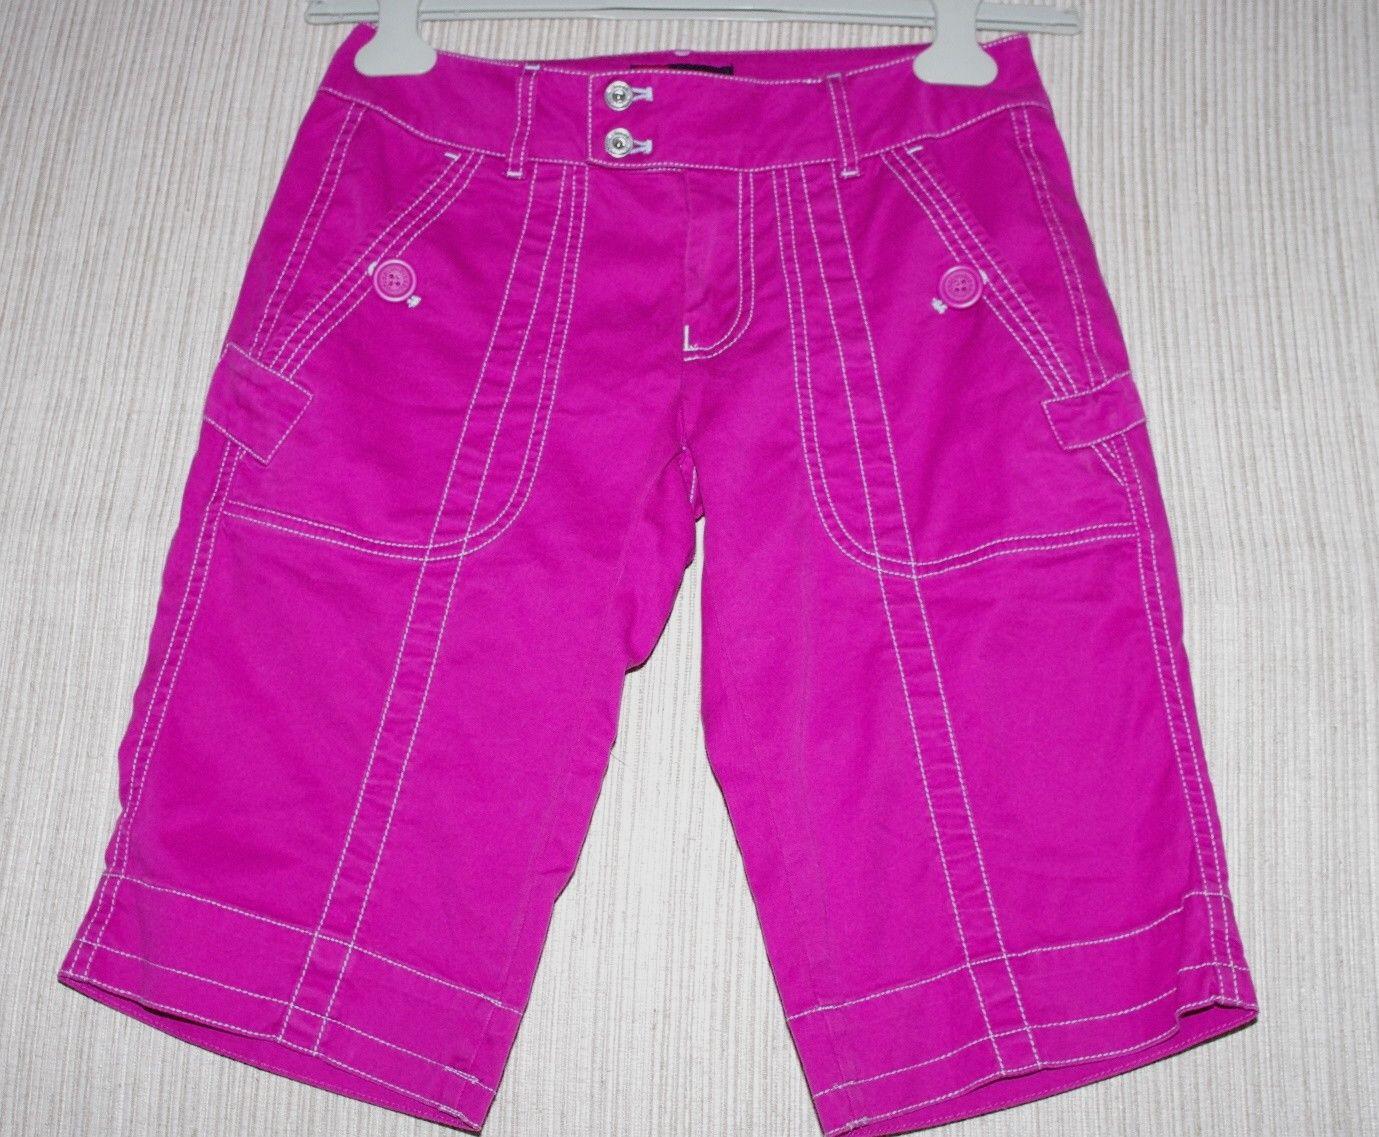 Diesel Pink Cotton Blend Women's Bermuda Shorts Size  4 (S, 27)